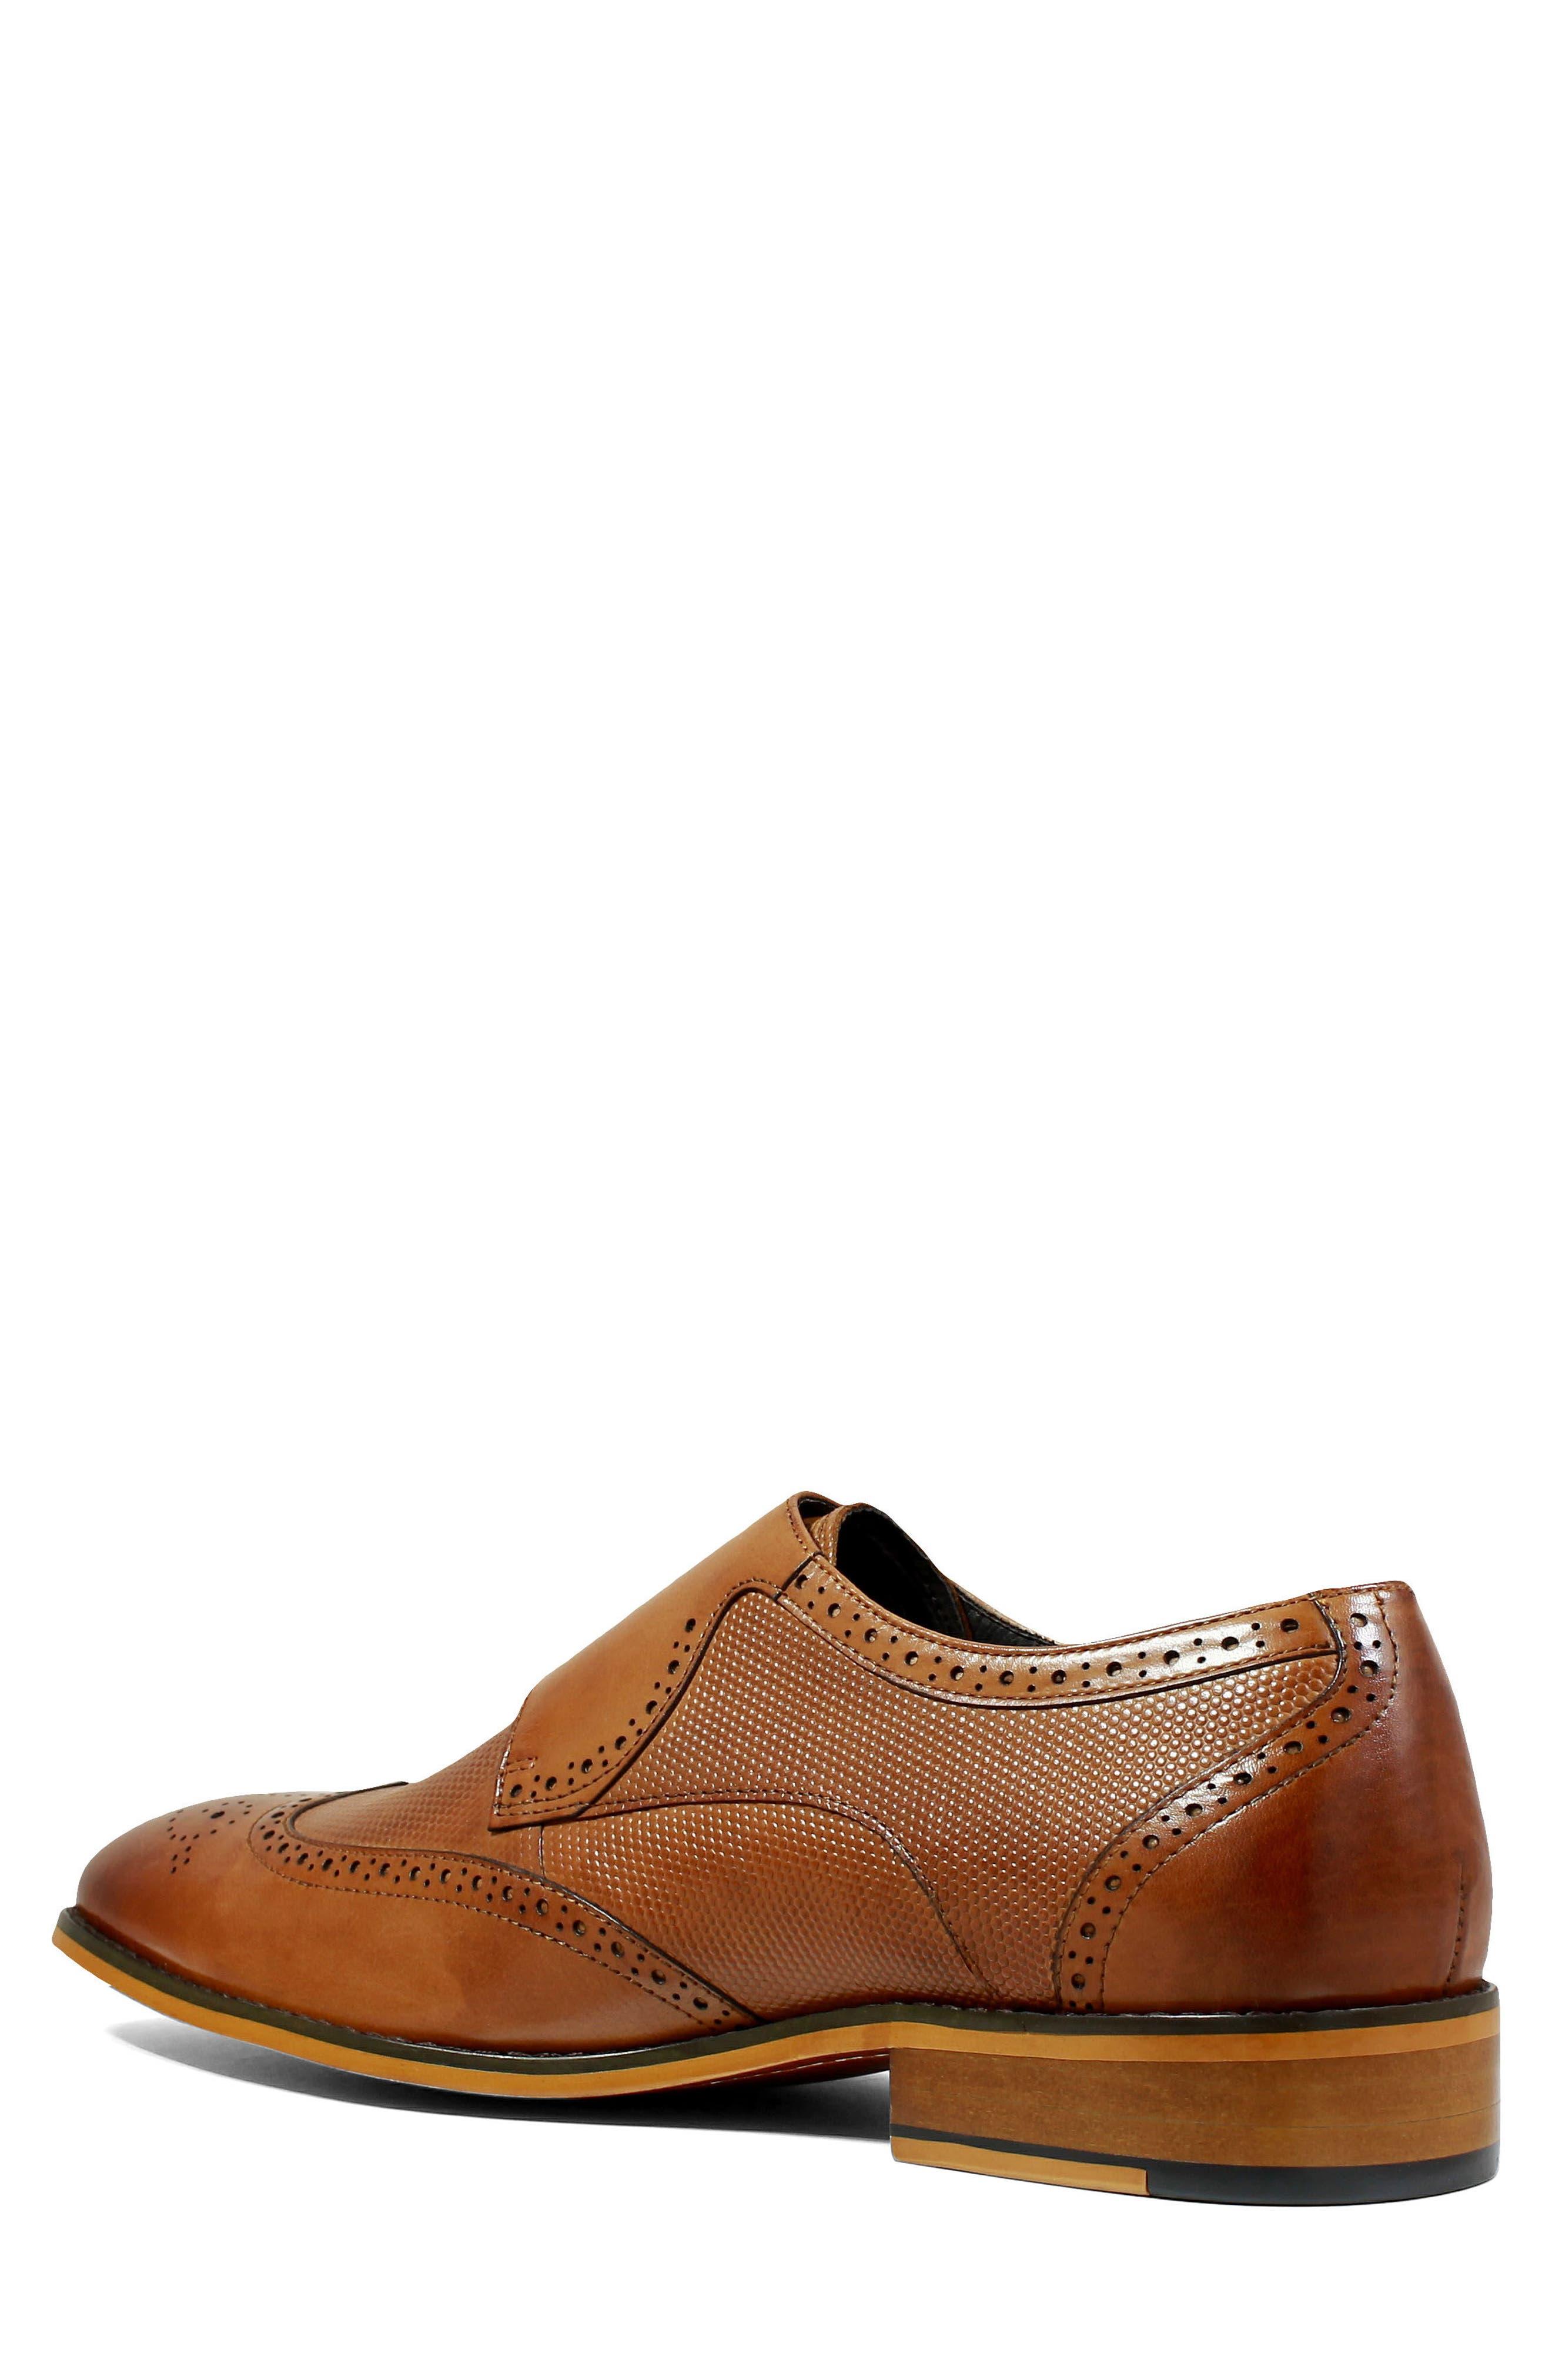 Lavine Wingtip Monk Shoe,                             Alternate thumbnail 2, color,                             Saddle Tan Leather